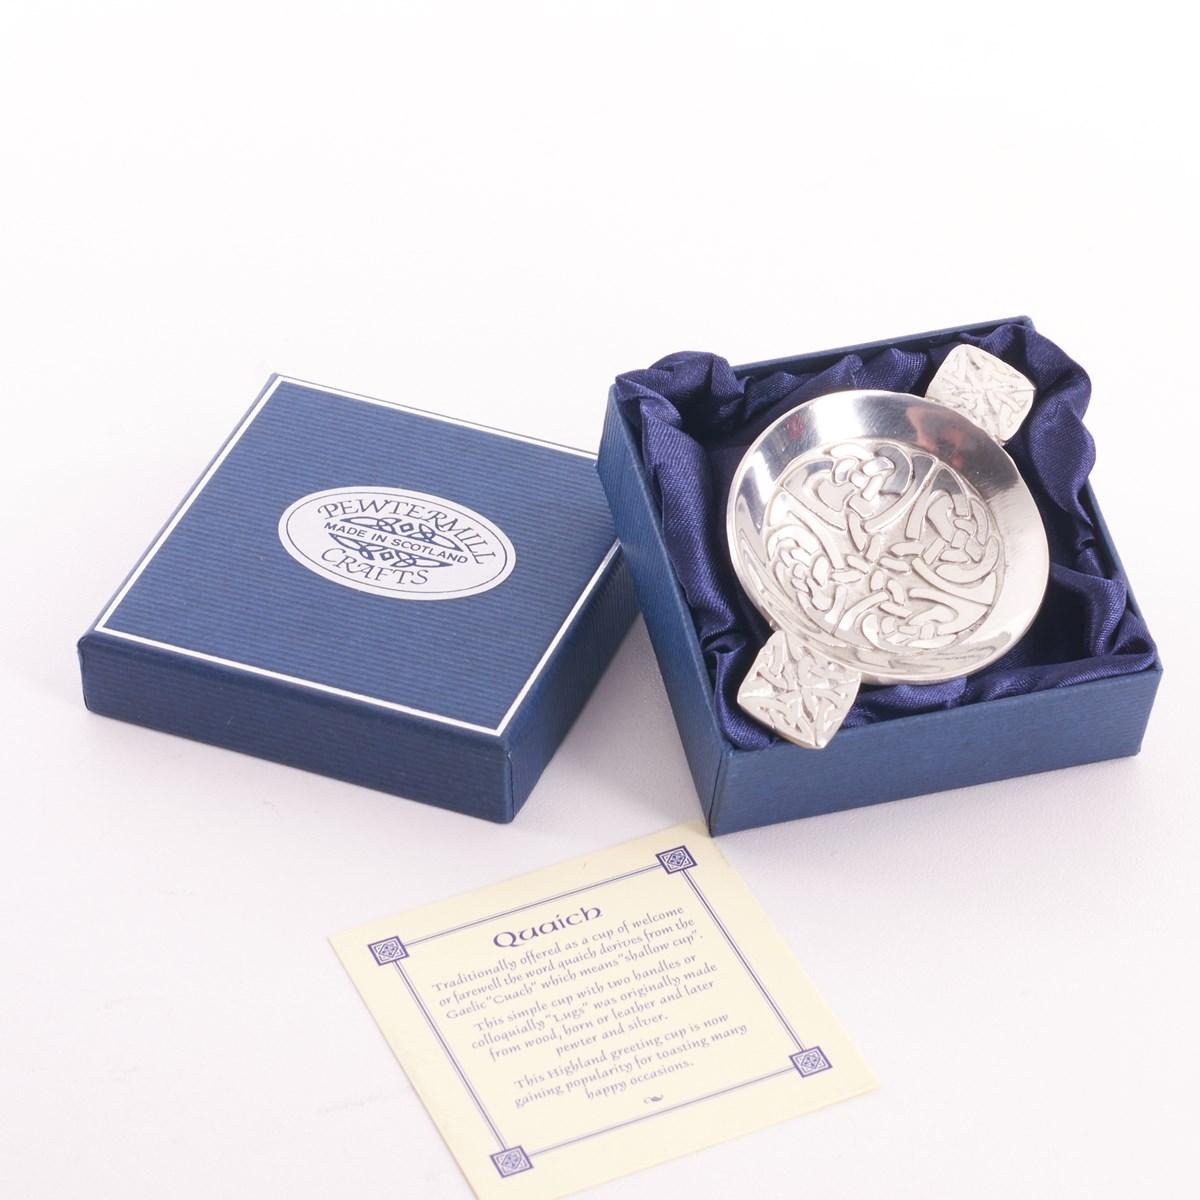 Celtic pewter mini quaich the kilt store 18160065miniquaichceltic25992789 kristyandbryce Choice Image